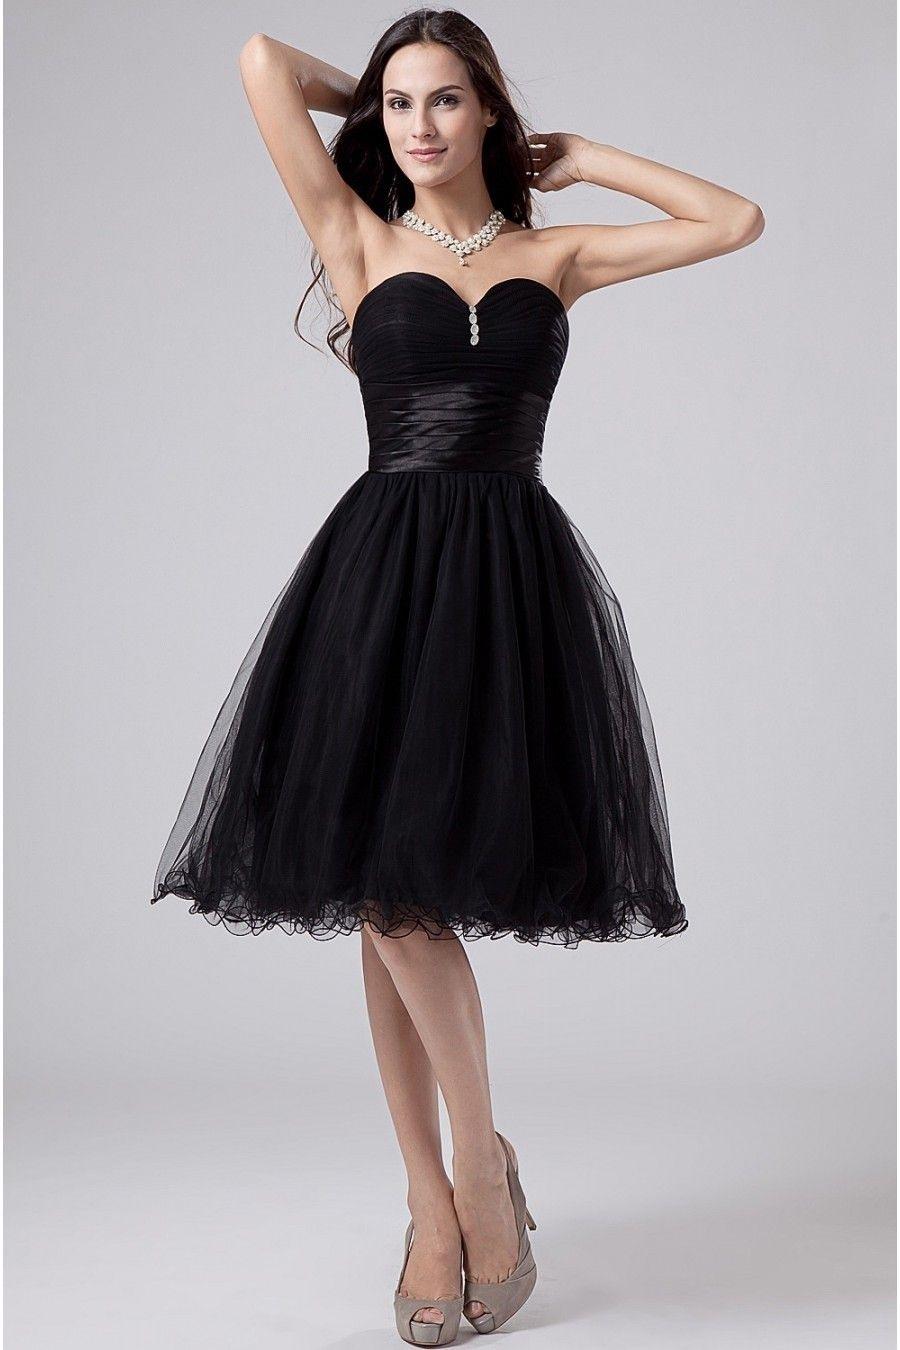 Formal Fantastisch Abendkleider Knielang Spezialgebiet20 Coolste Abendkleider Knielang Boutique